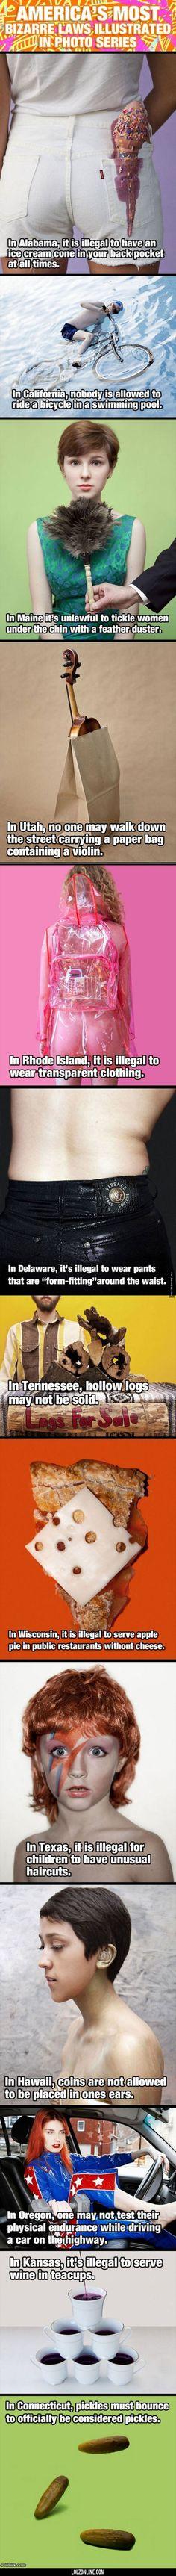 Americas Most Bizarre Laws#funny #lol #lolzonline